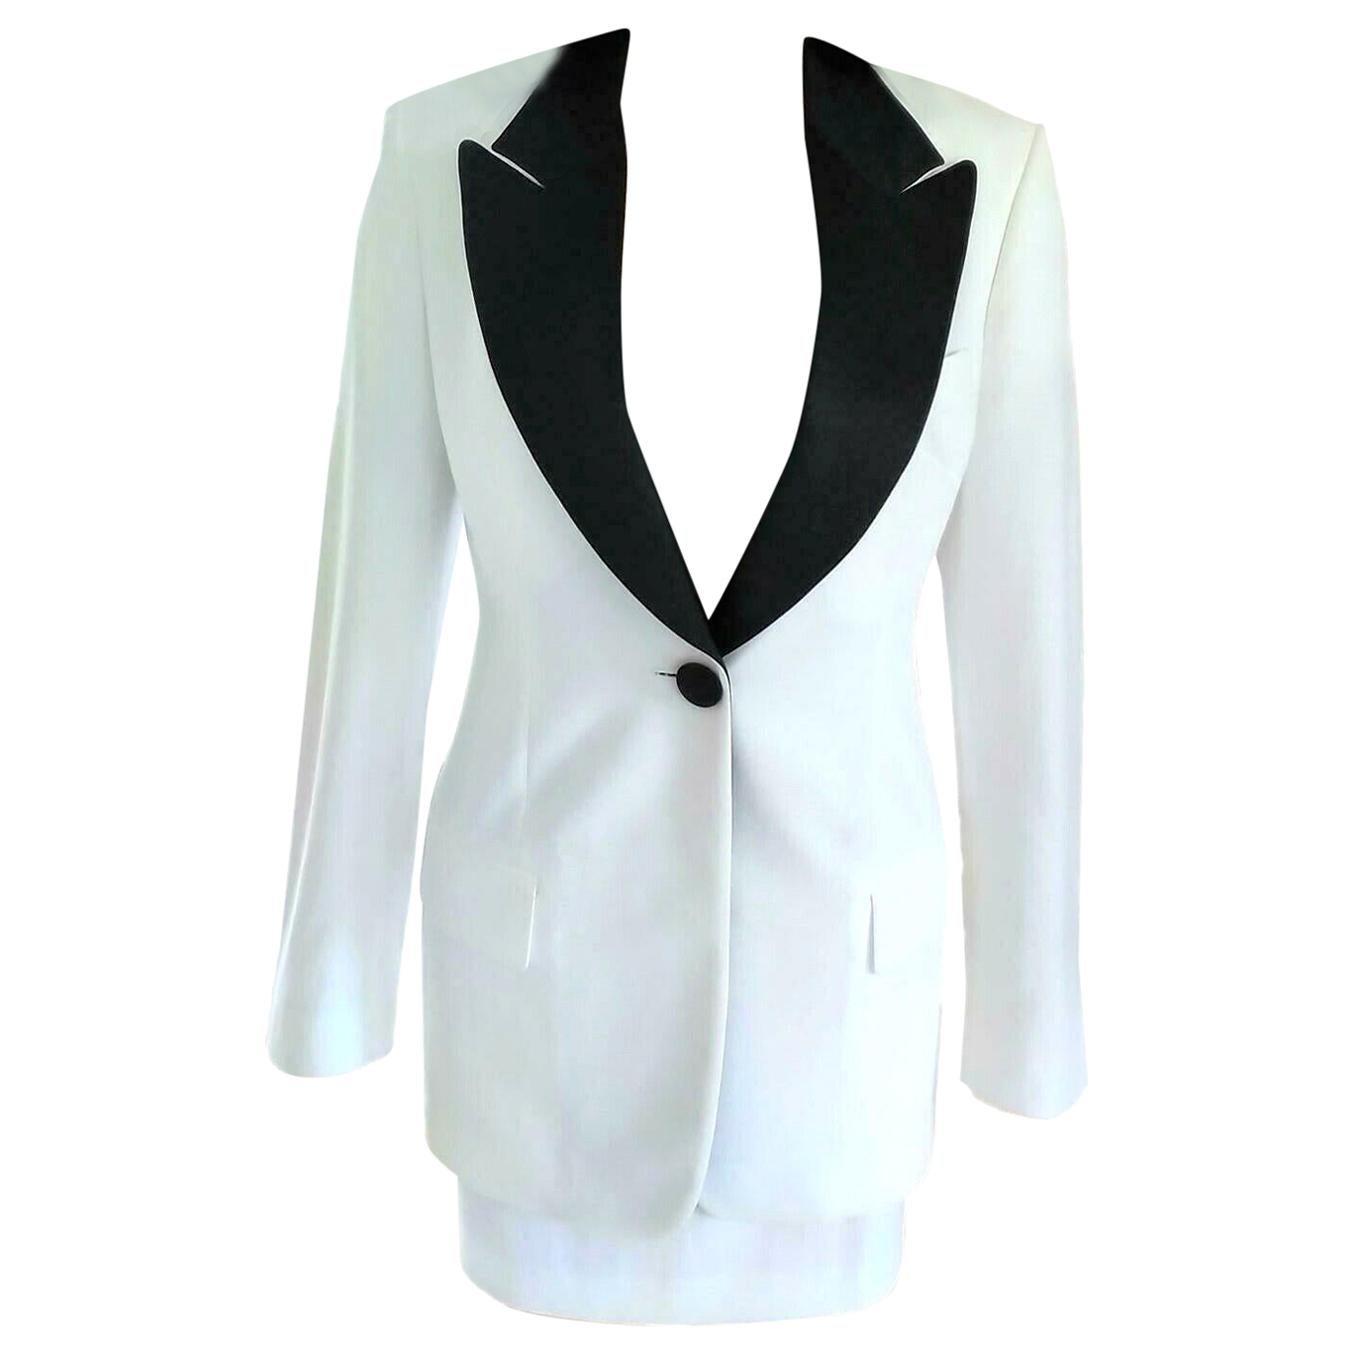 Dolce & Gabbana Crisp White & Black Tuxedo Jacket Mini Skirt Suit IT 40/ US 2 4